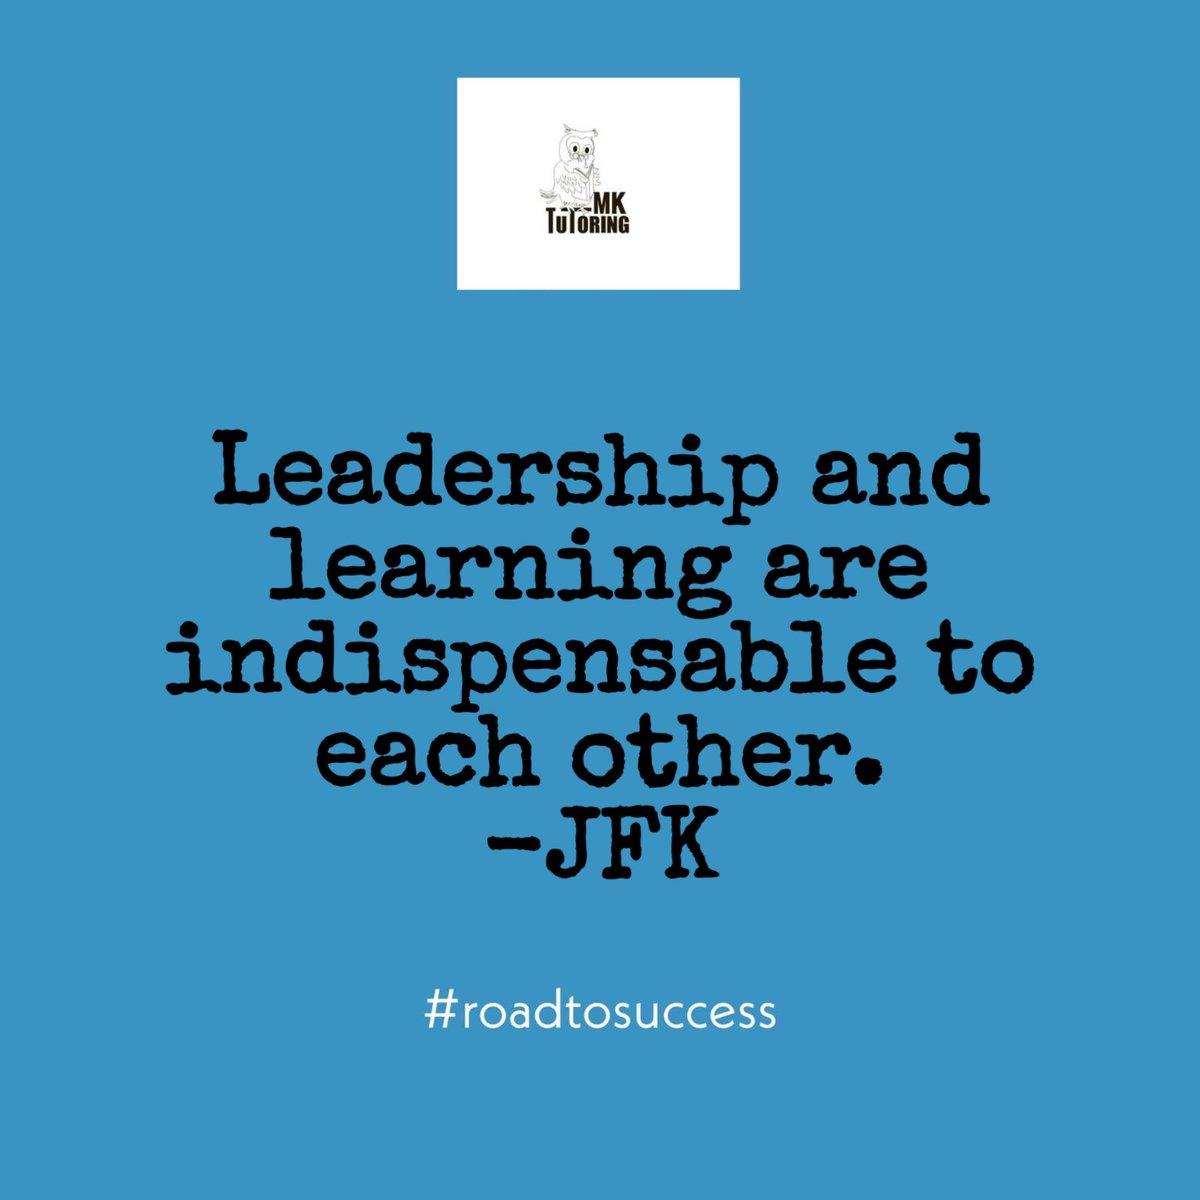 #MondayMotivation #PresidentsDay2020 #learn #tutor #onlinetutor #mktutoring #roadtosuccess pic.twitter.com/f8dS5xMh1w